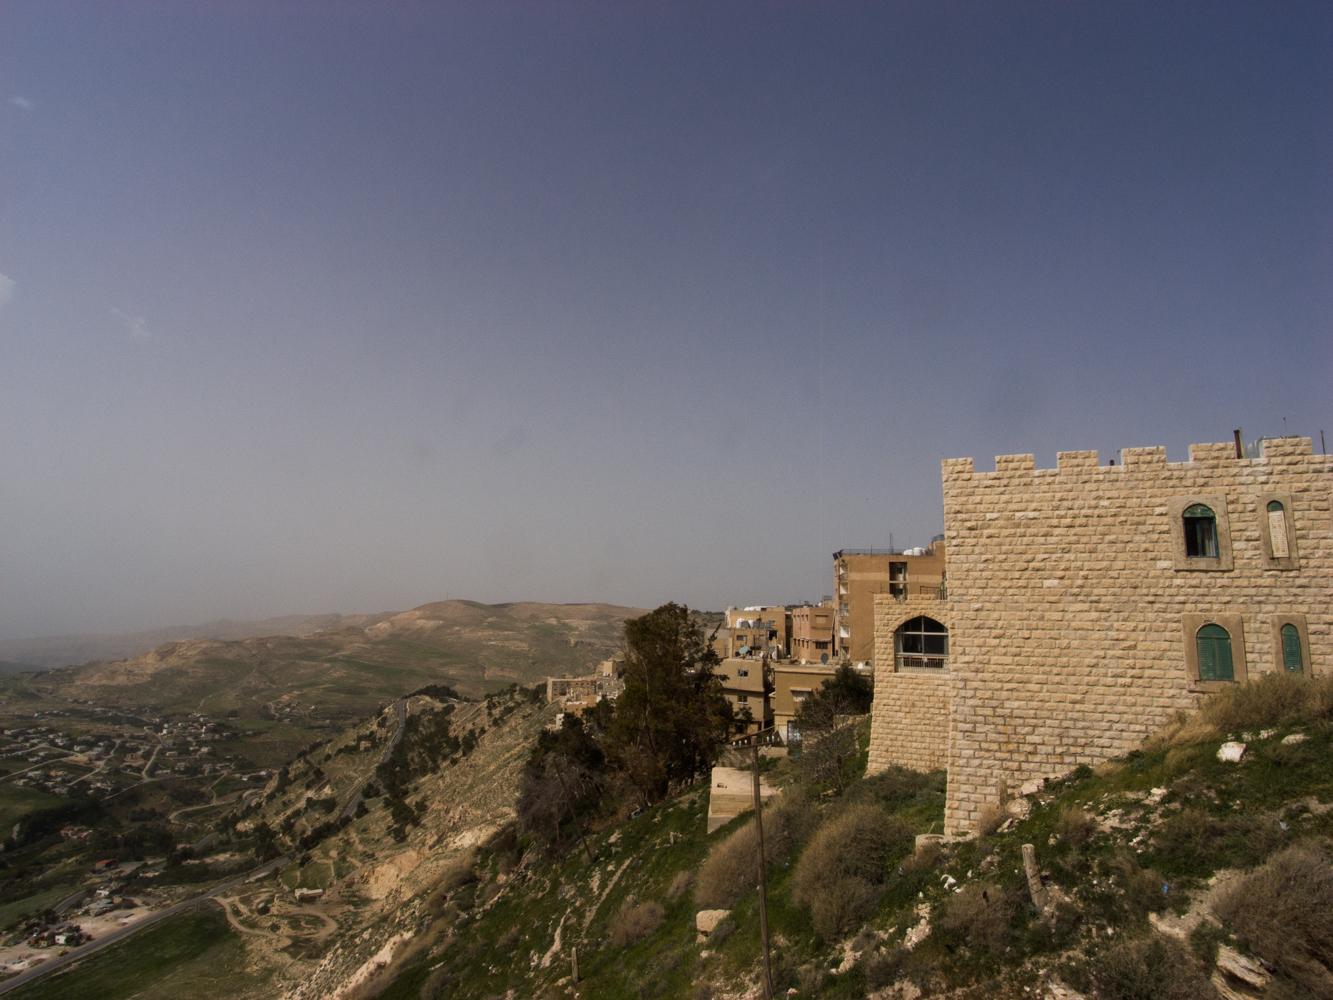 Jordanien_Aqaba_Rotes_Meer_Amman_Fotos-45